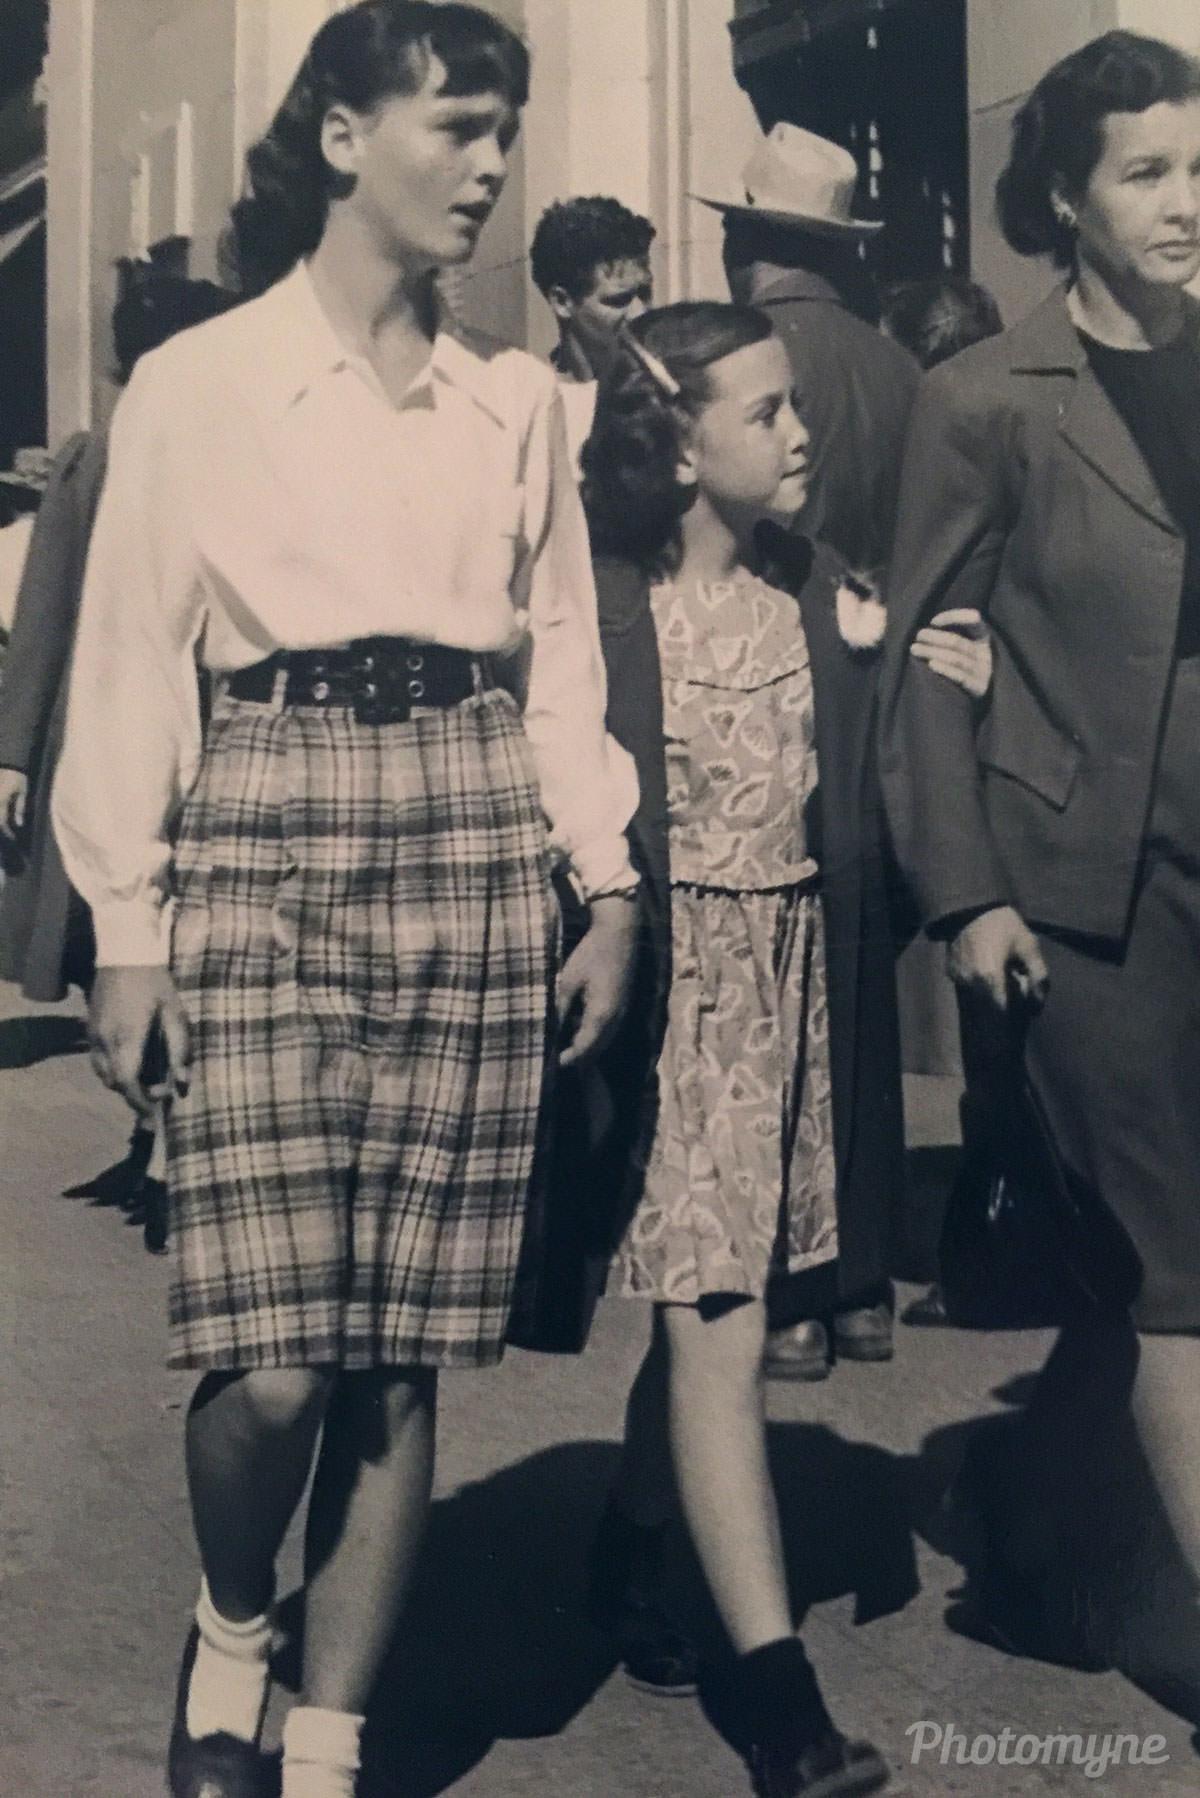 Street photographer, Tucson, Arizona, US, 1946